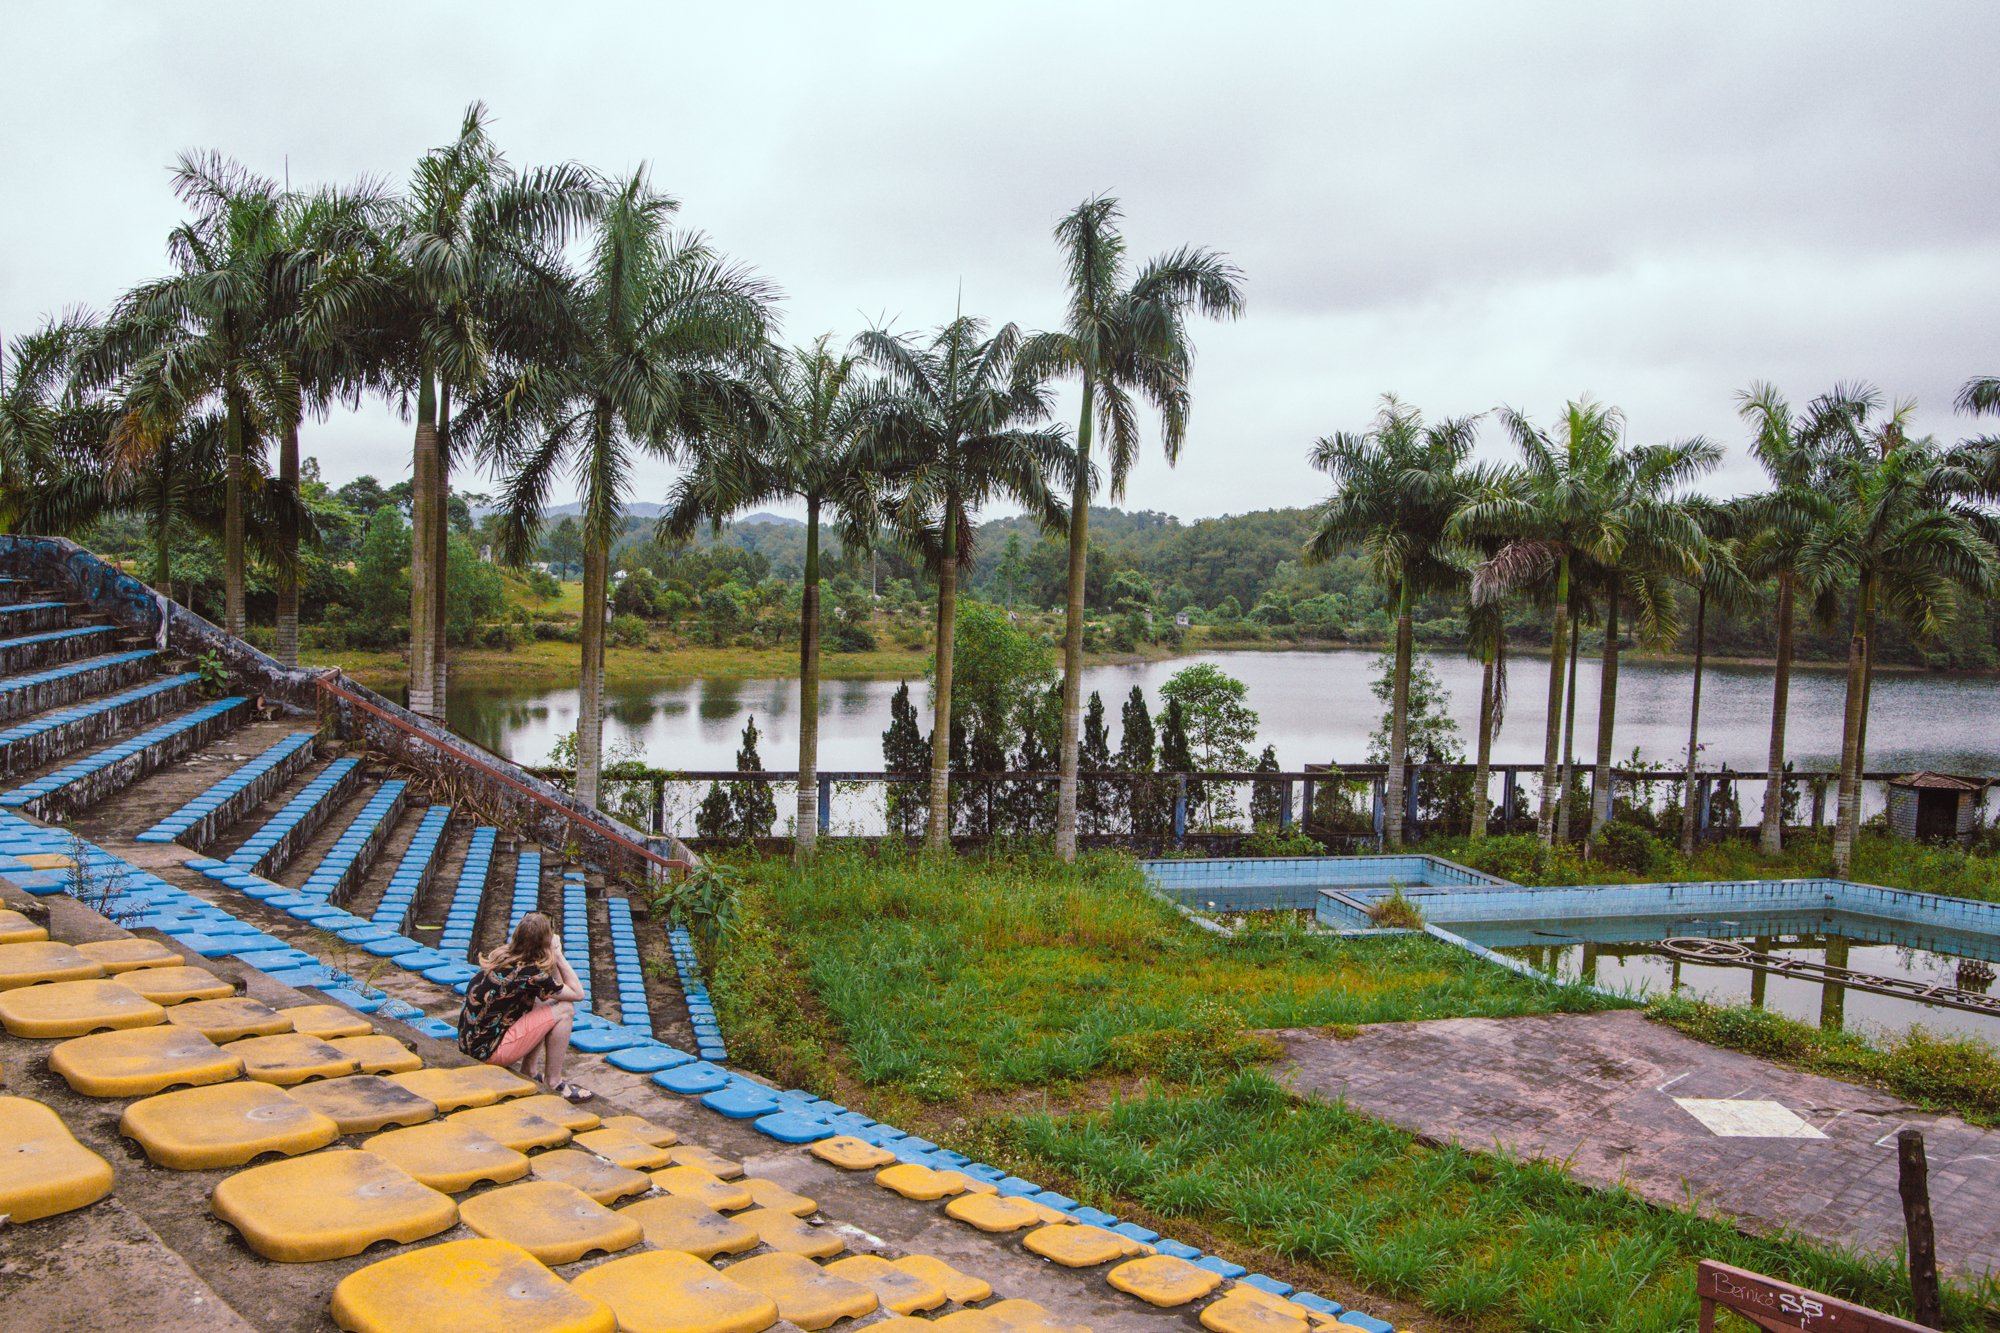 Exploring the Abandoned waterpark hue